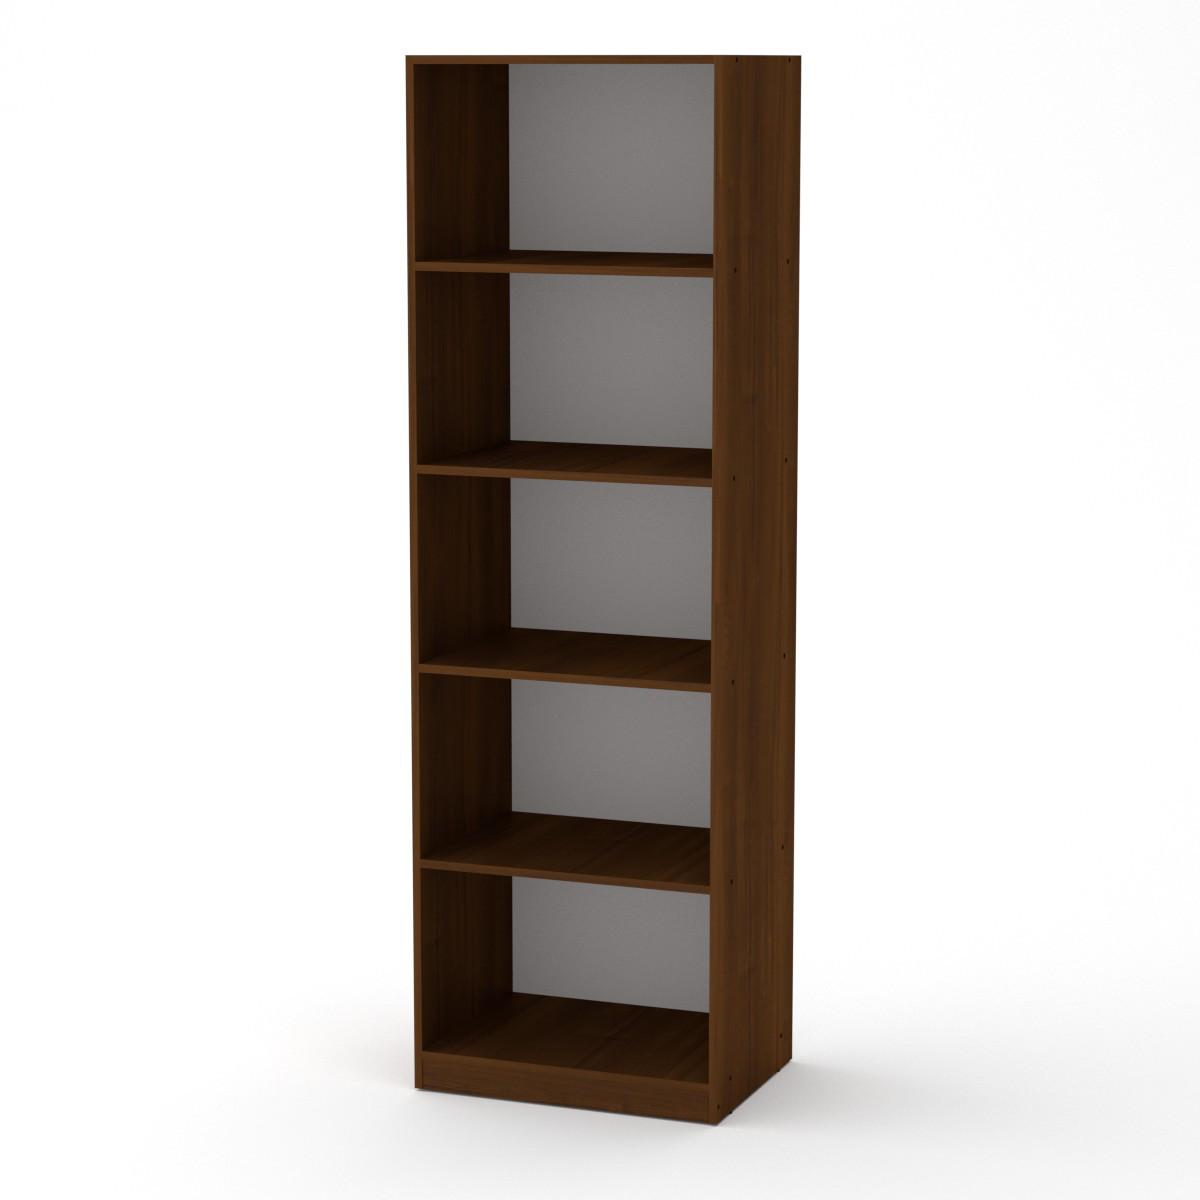 Шкаф книжный КШ-1 орех экко Компанит (61х45х195 см)